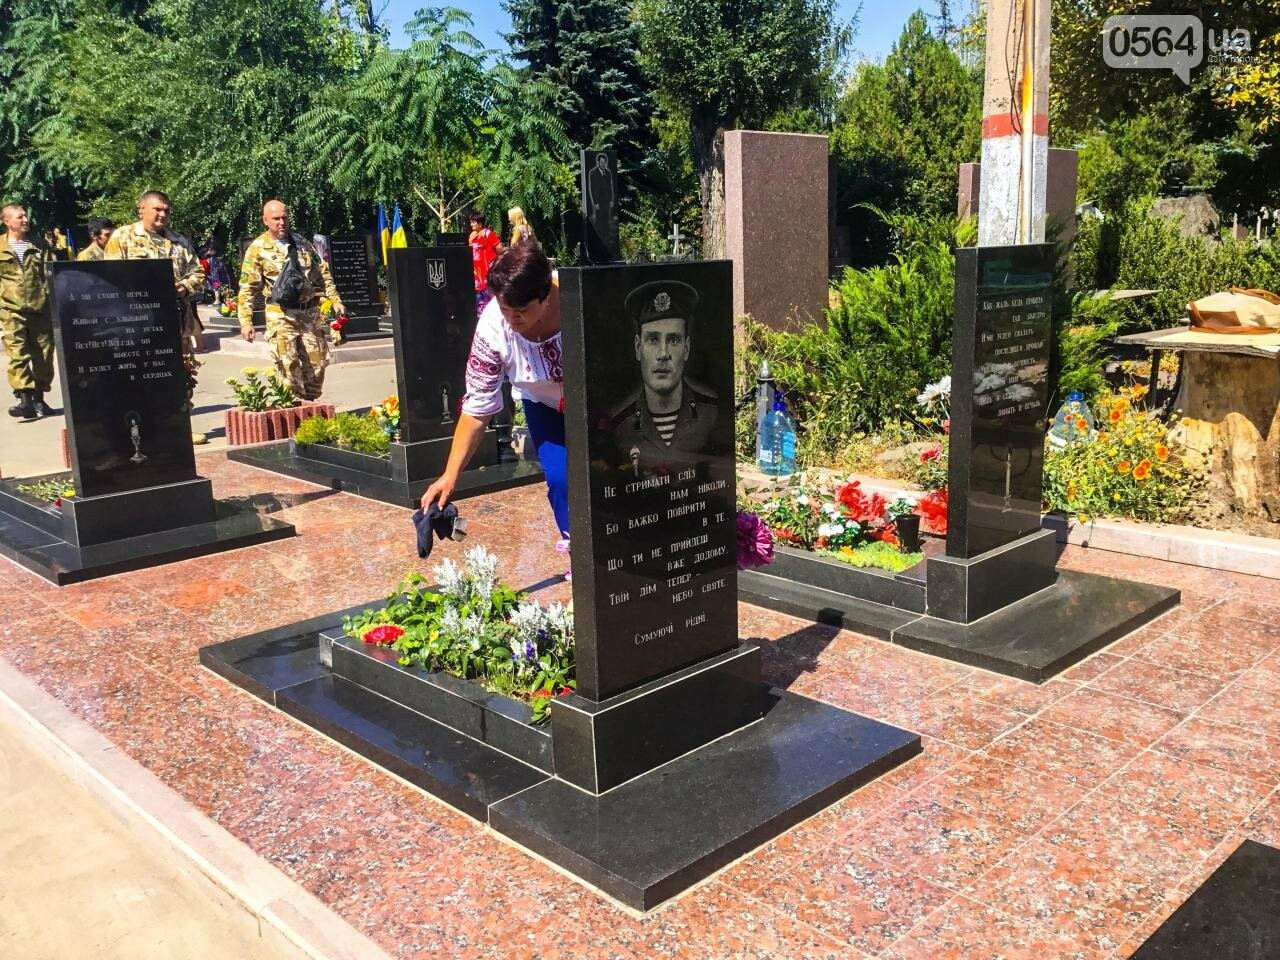 На Аллее Героев провели панихиду по погибшим в зоне АТО криворожанам, - ФОТО , фото-41